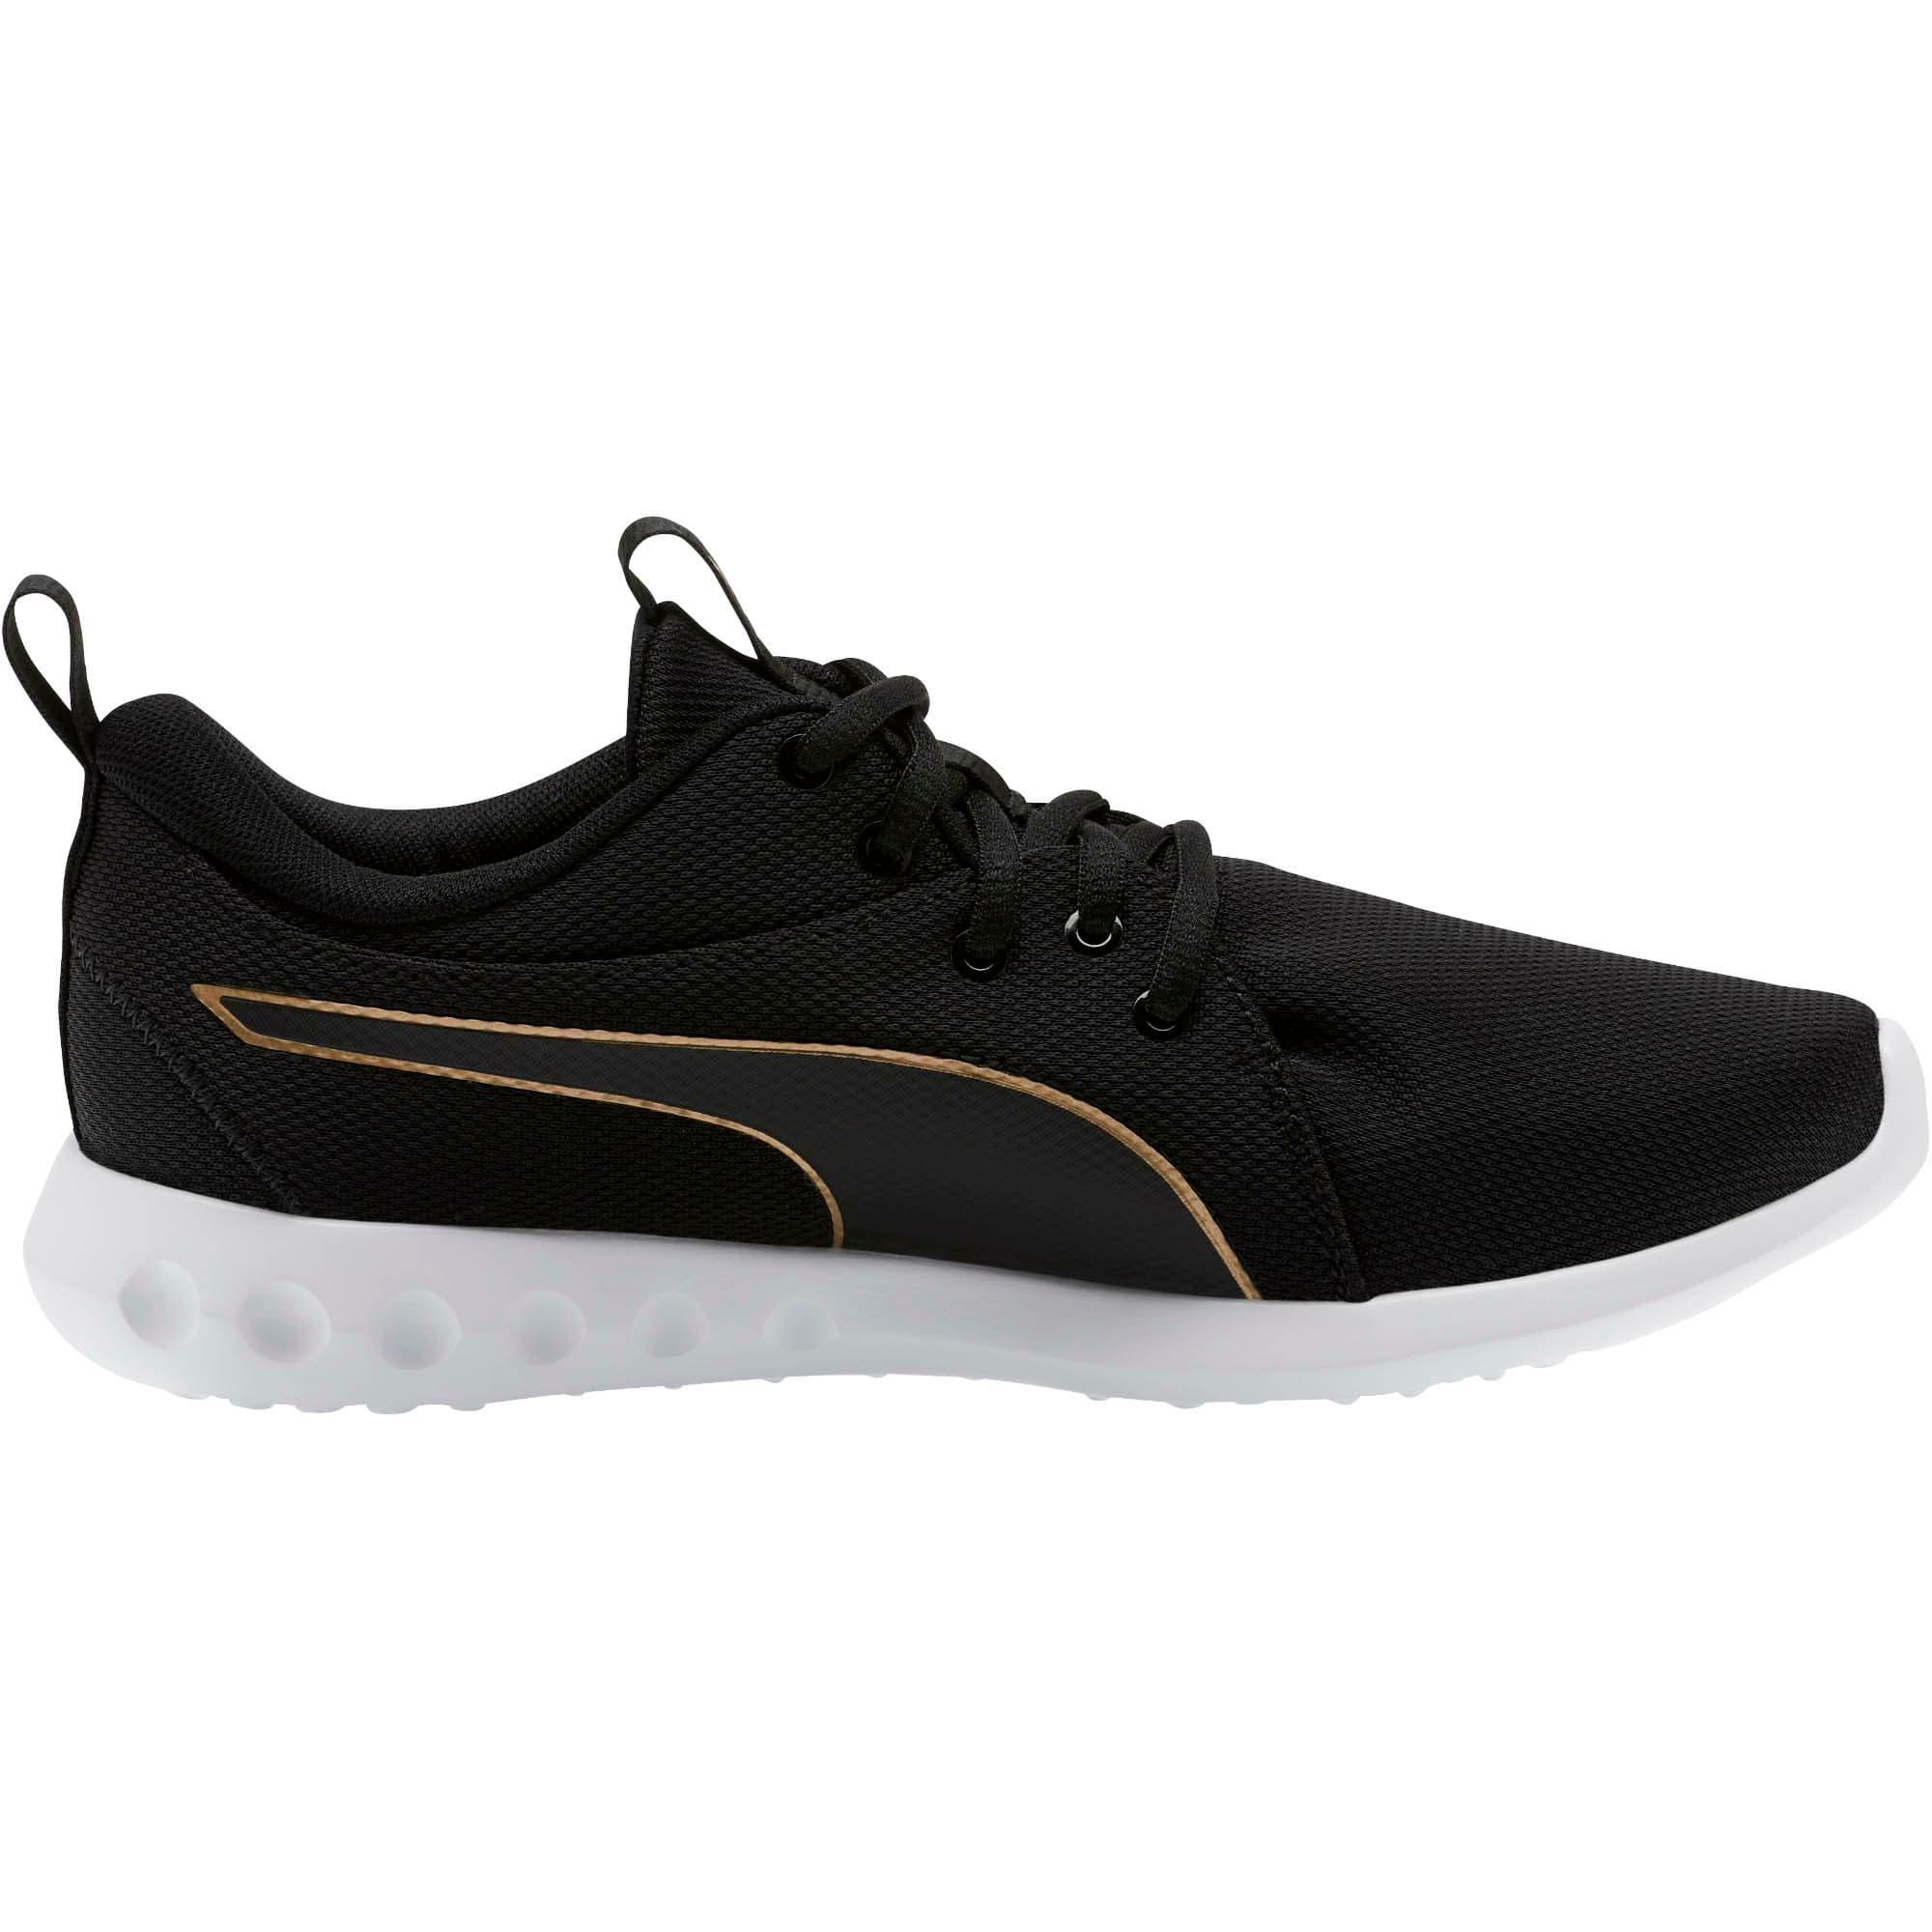 Thumbnail 4 of Carson 2 Cosmo Women's Running Shoes, Puma Black-Metallic Gold, medium